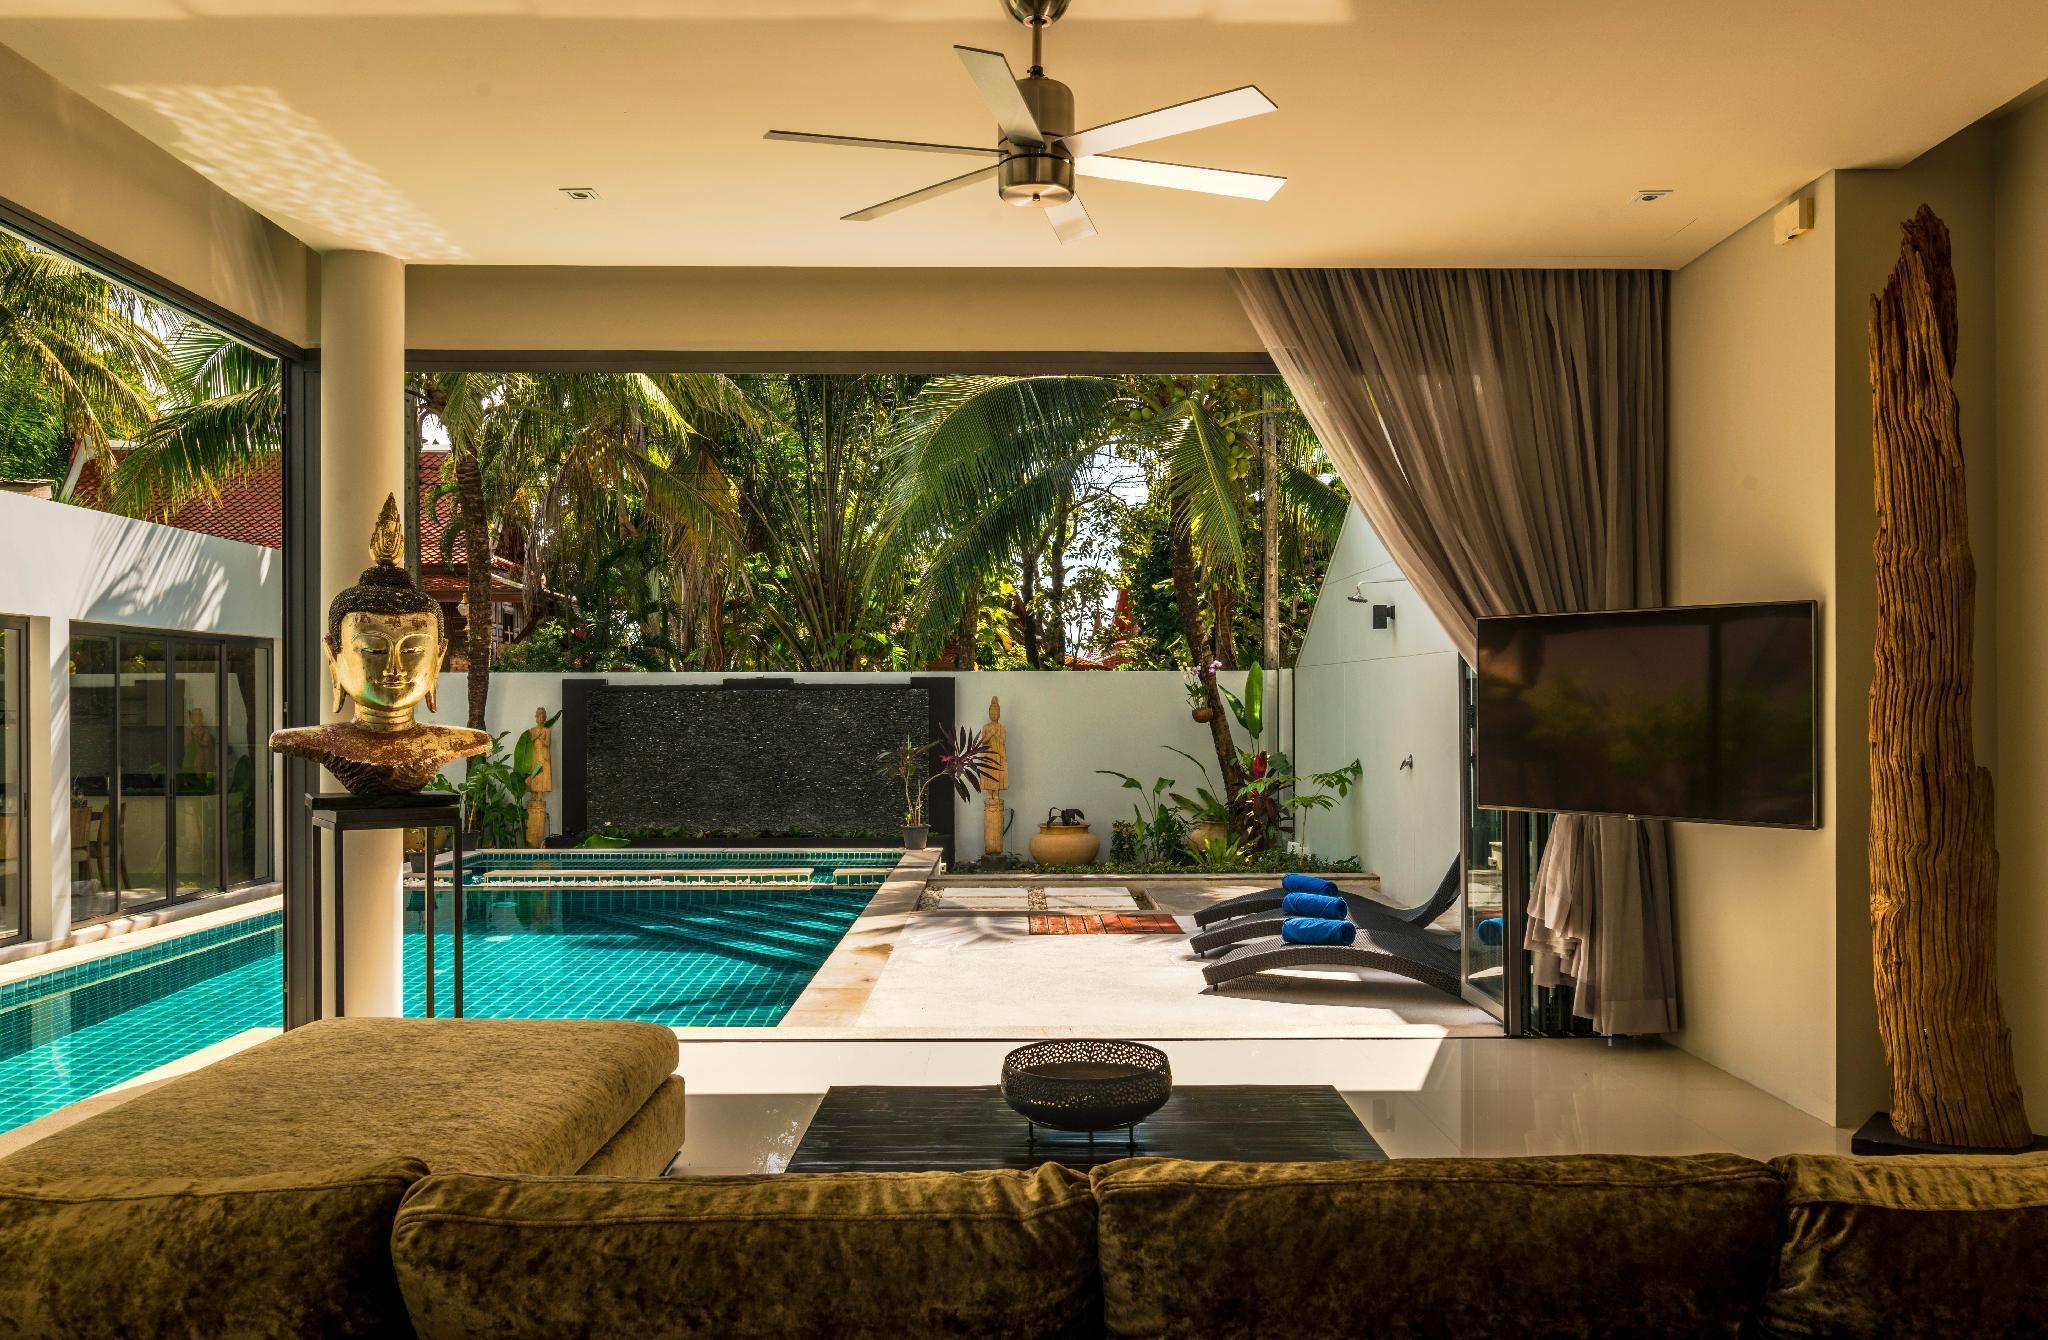 Amazing 5br, Seaview private PoolVilla by Intira วิลลา 5 ห้องนอน 7 ห้องน้ำส่วนตัว ขนาด 600 ตร.ม. – หาดราไวย์